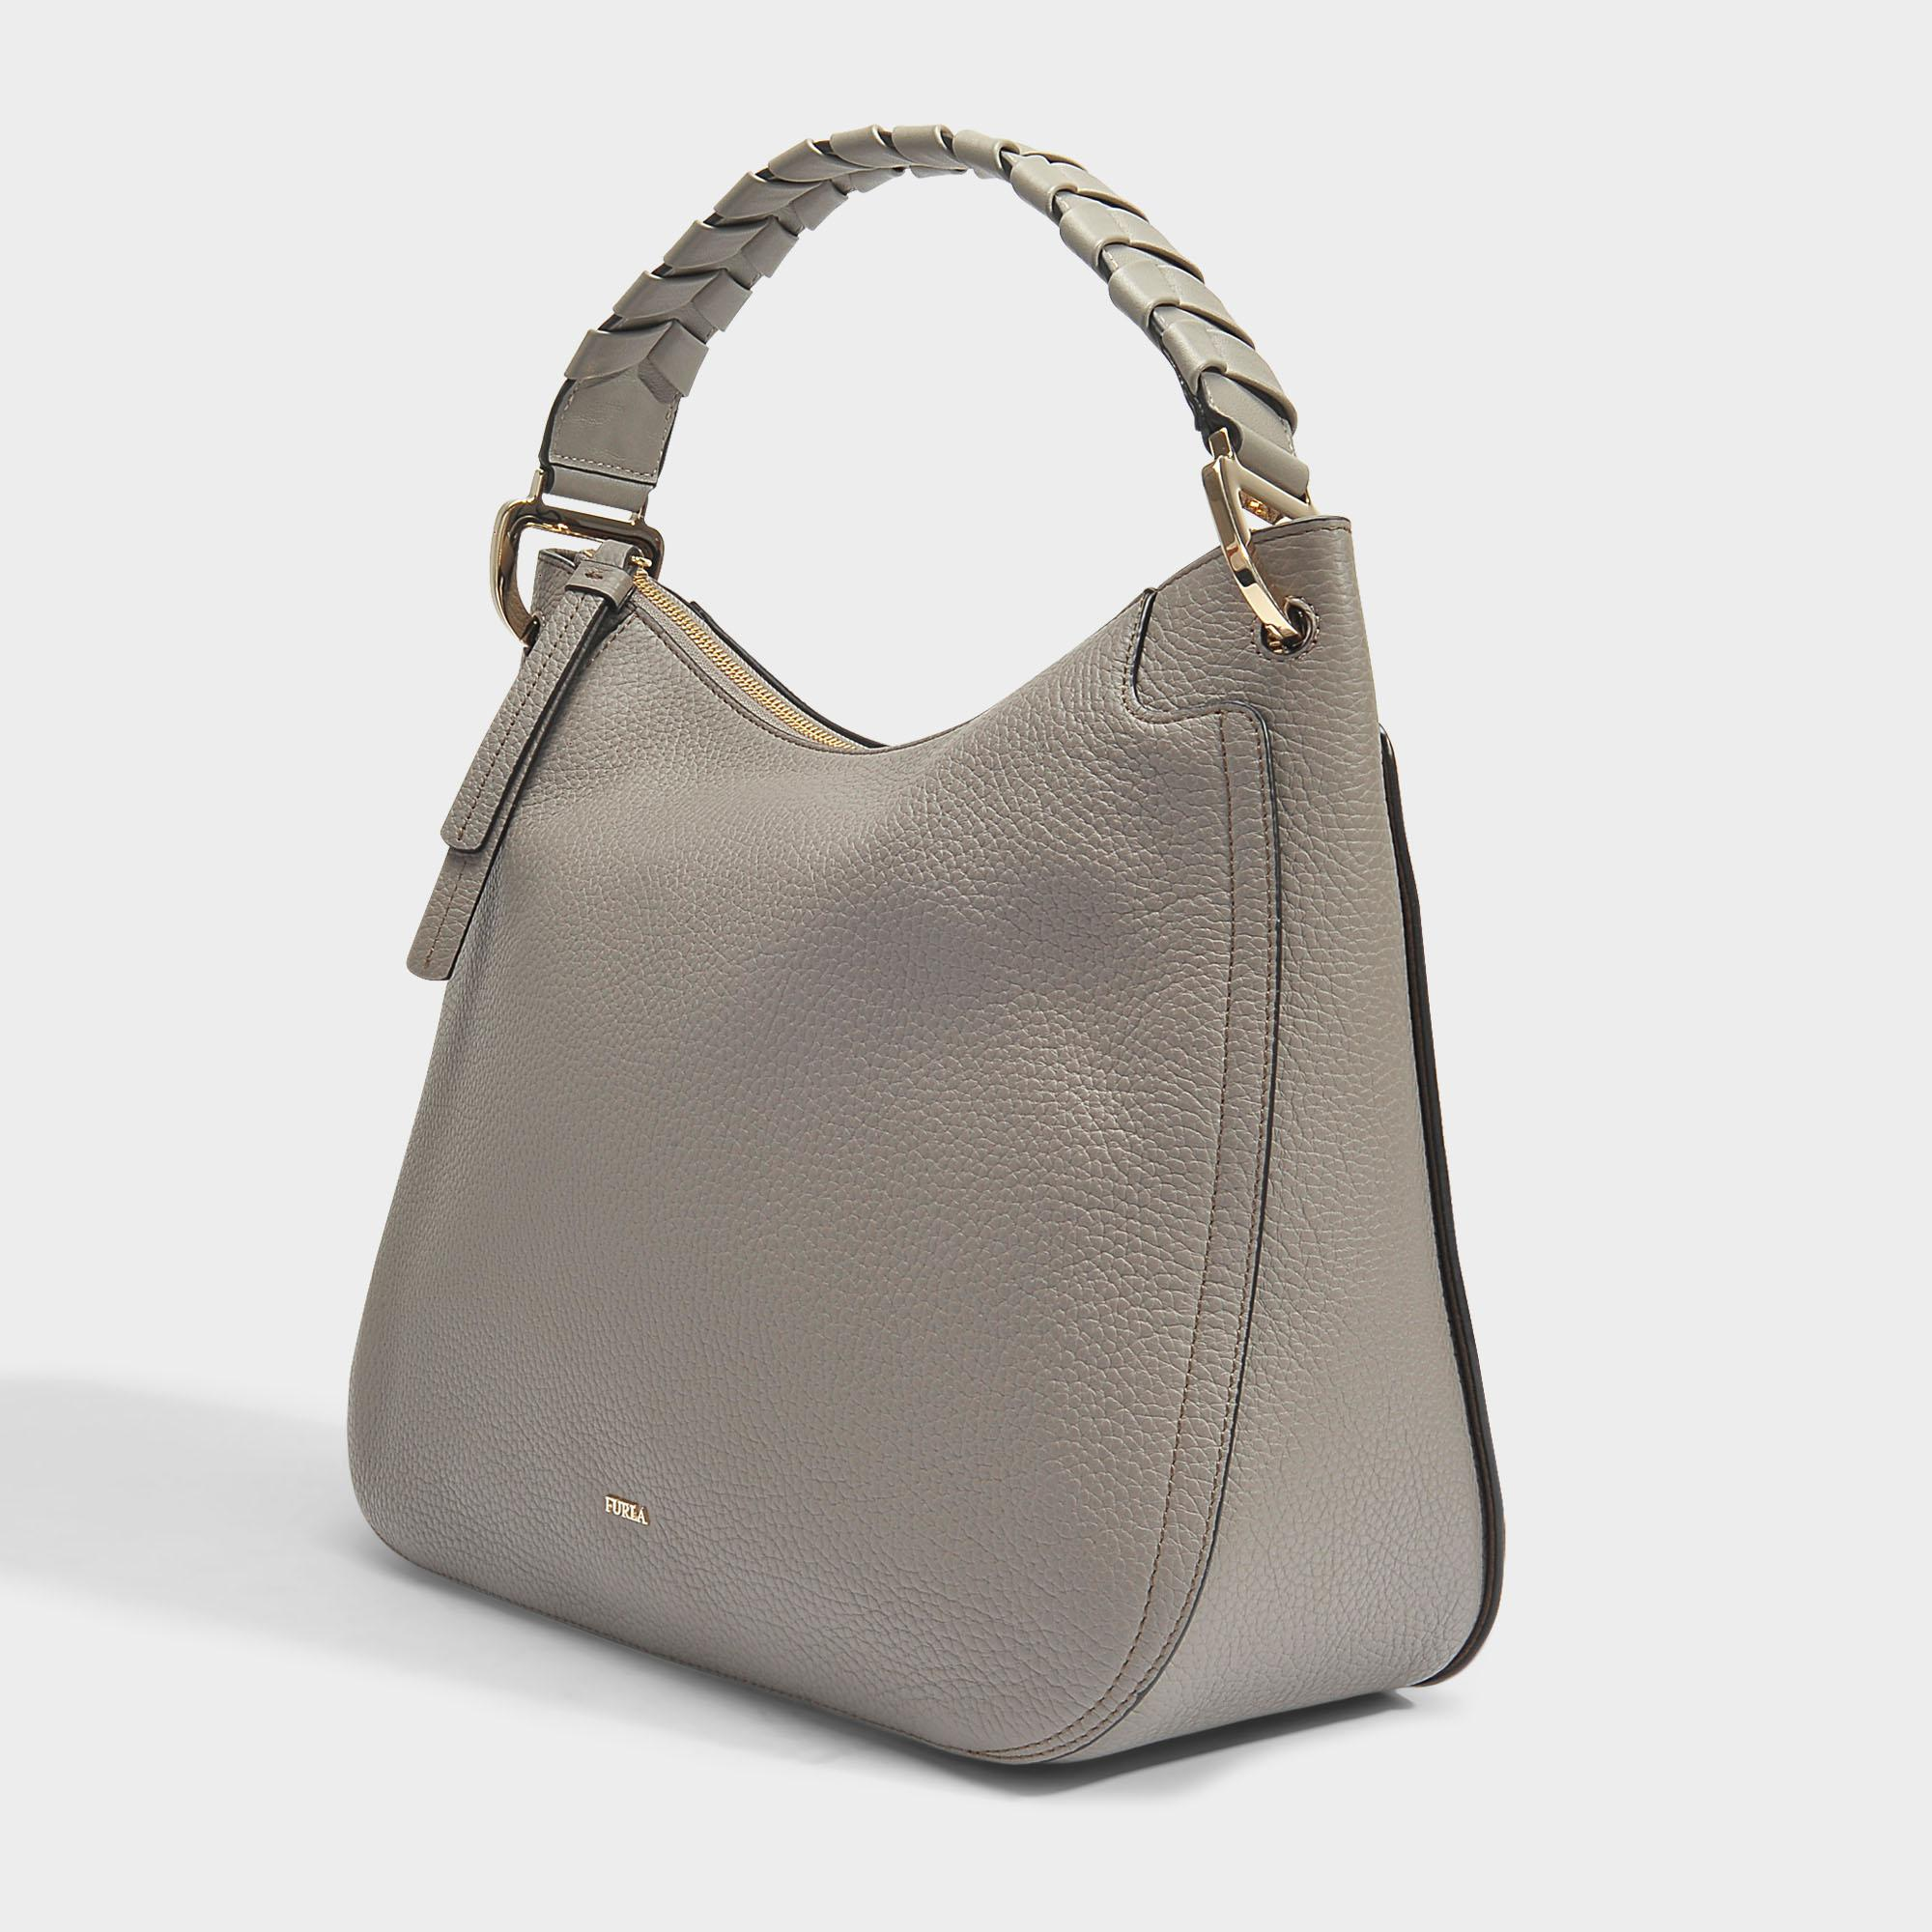 Rialto Large Hobo Bag in Sabbia Calfskin Furla HlVqN